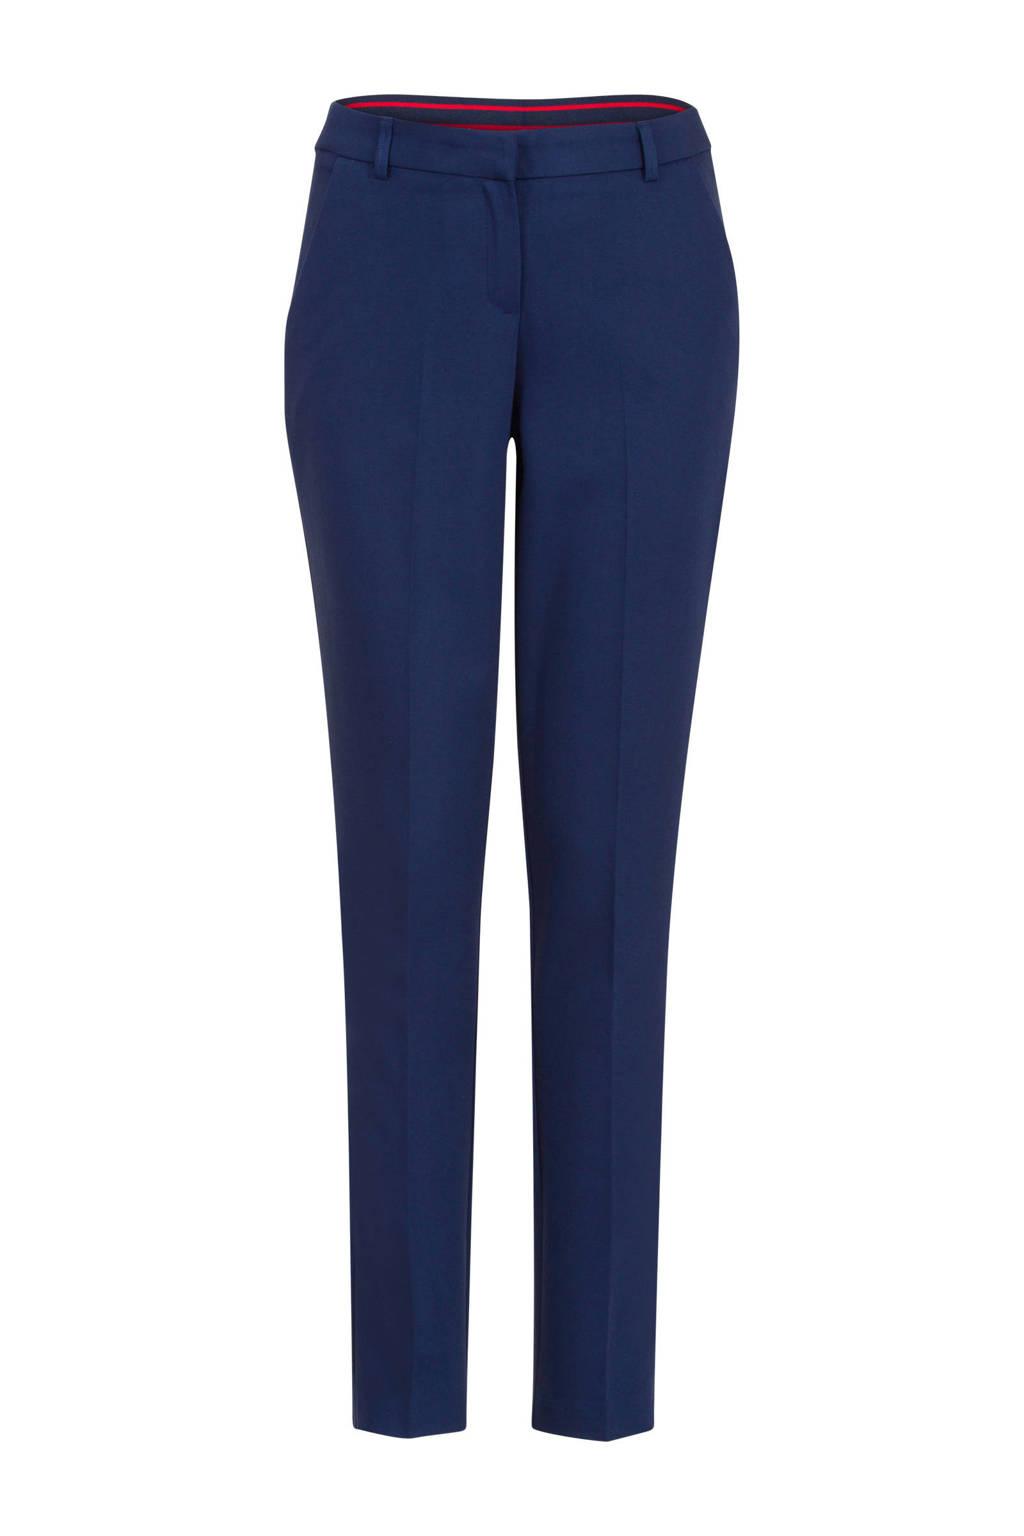 Steps slim fit pantalon met bies donkerblauw, Donkerblauw